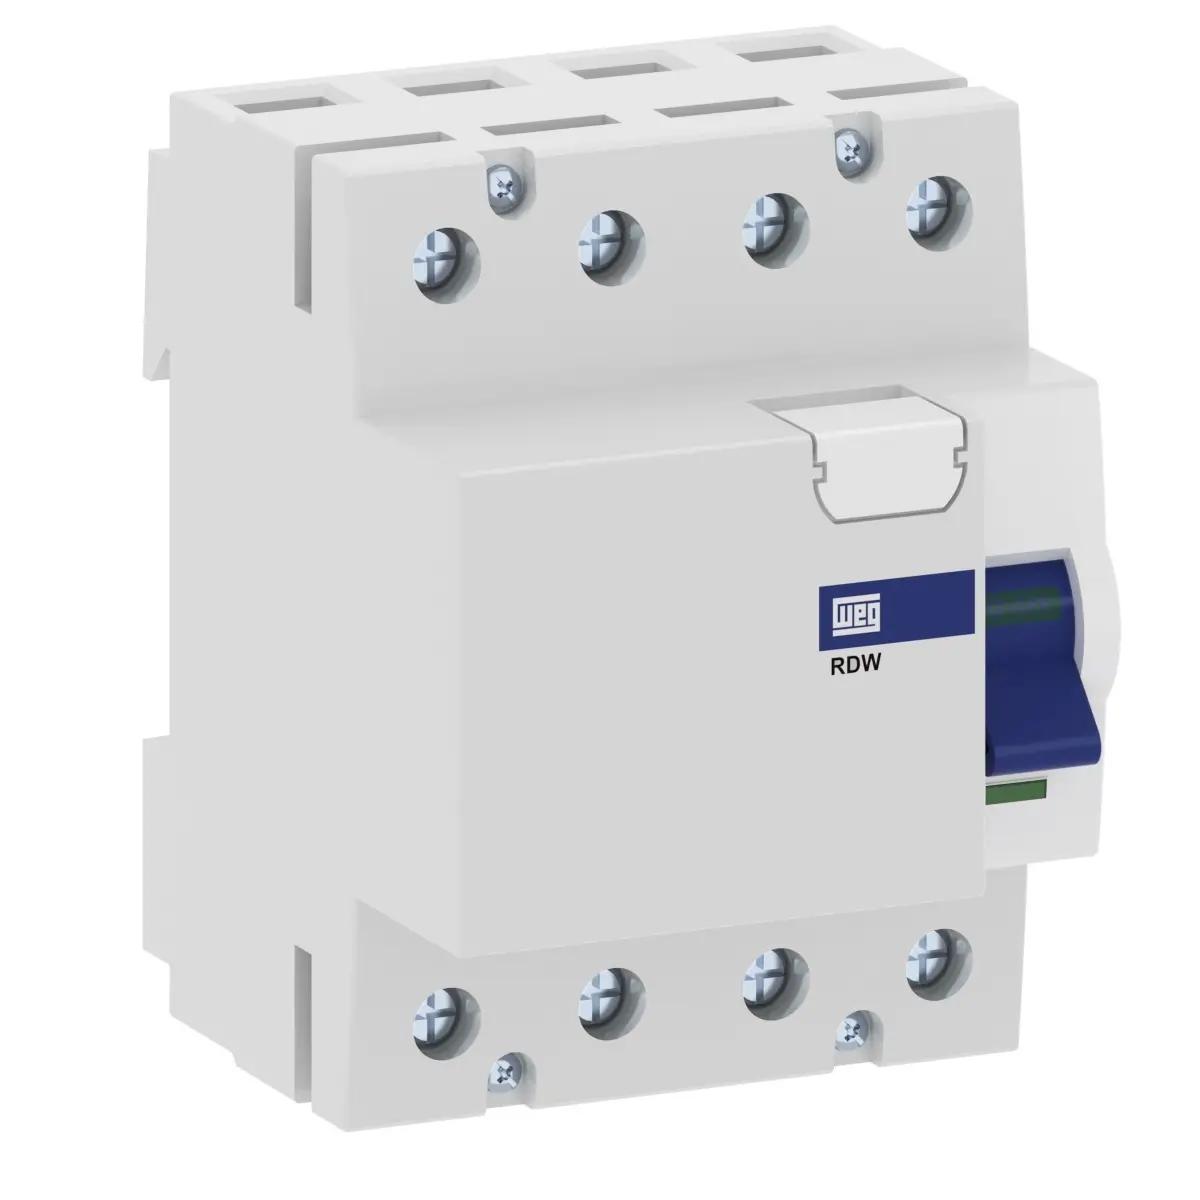 Interruptor Diferencial Residual (Dr) Rdw-30-40-4-D17